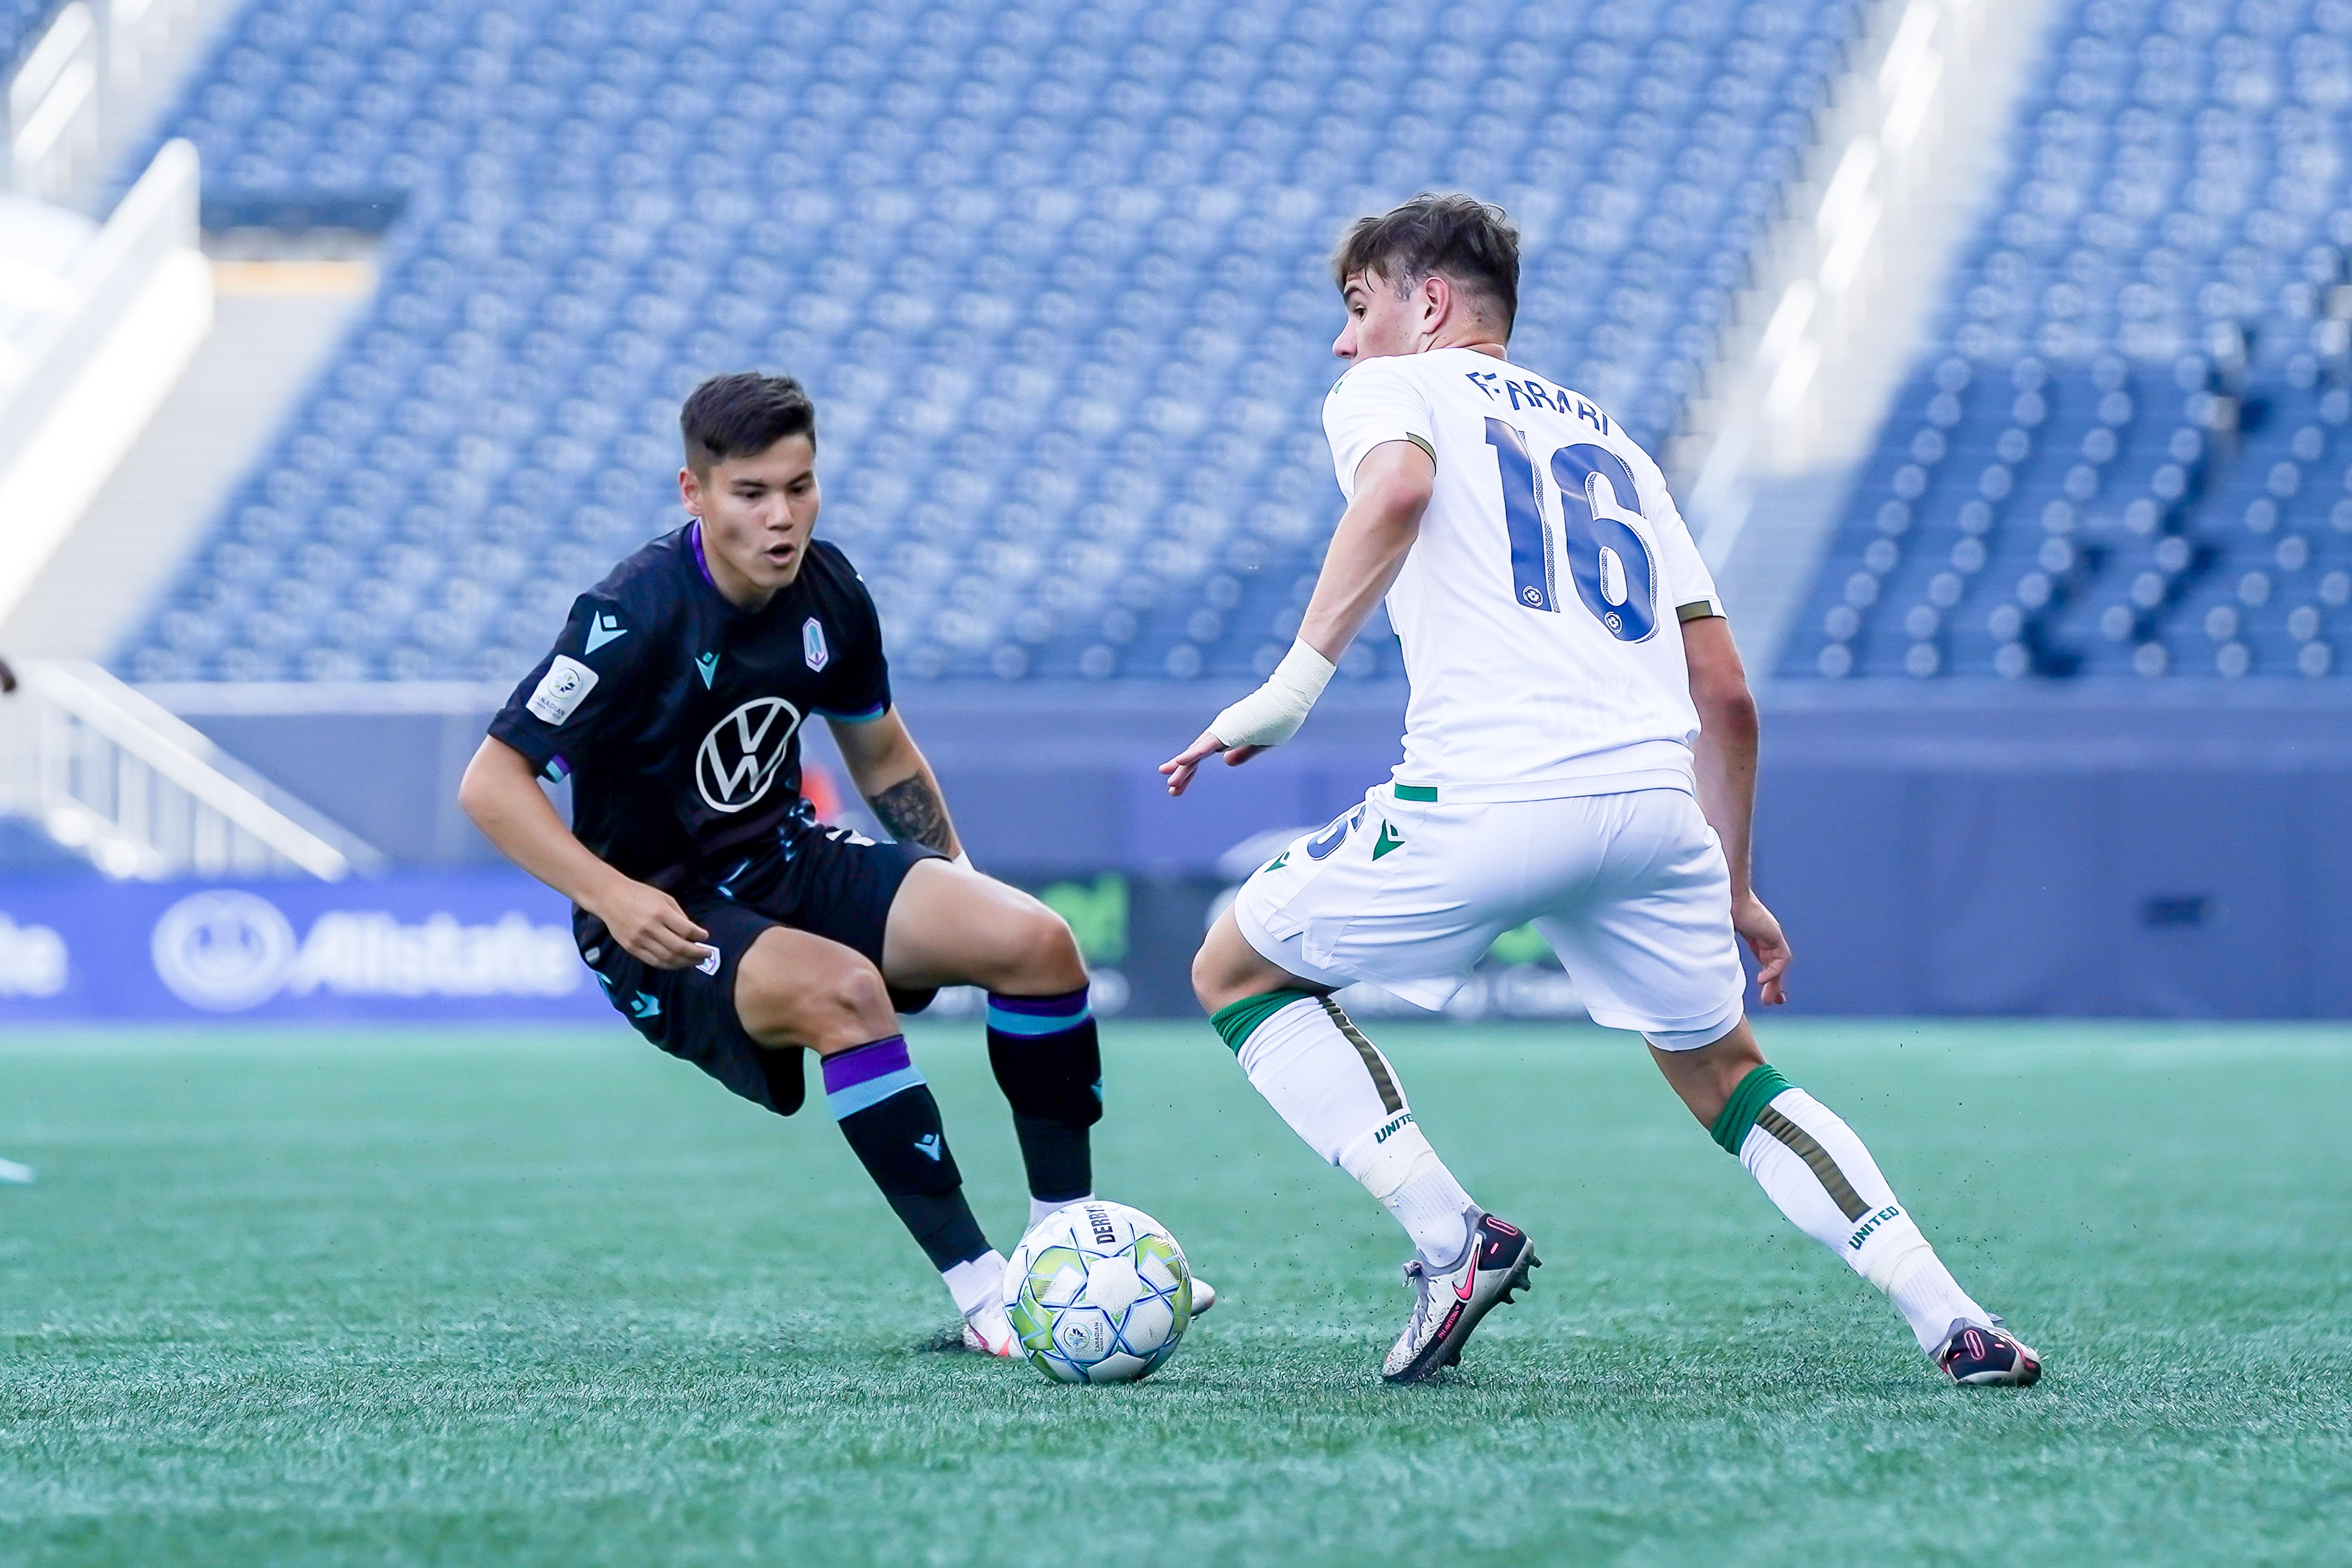 Max Ferrari plays the ball as Kadin Chung defends. (CPL)